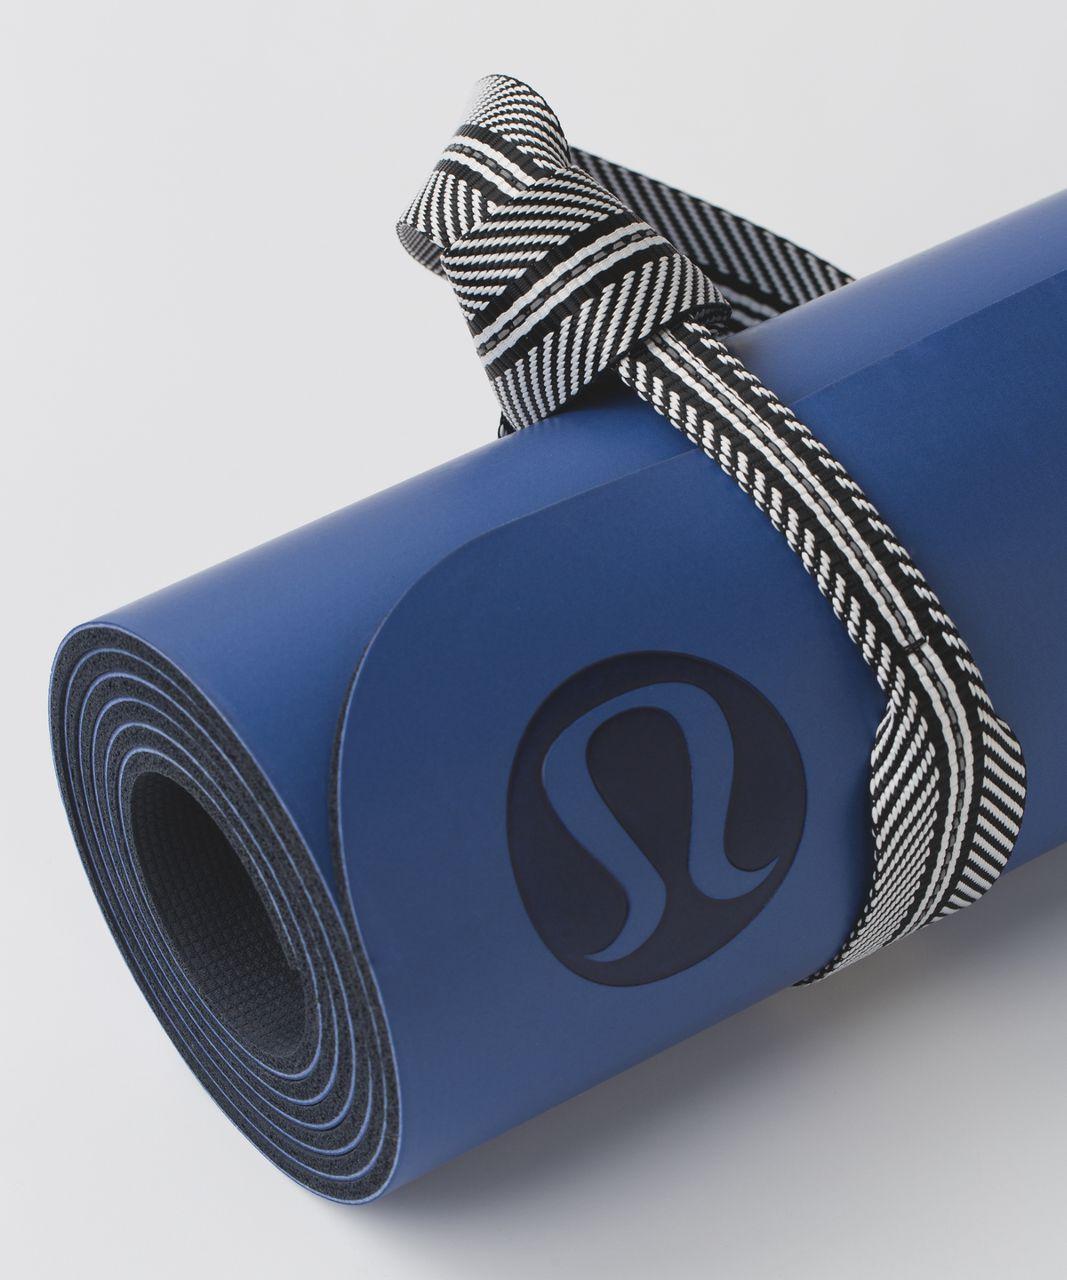 Lululemon Loop It Up Mat Strap *Reflective - Black / White